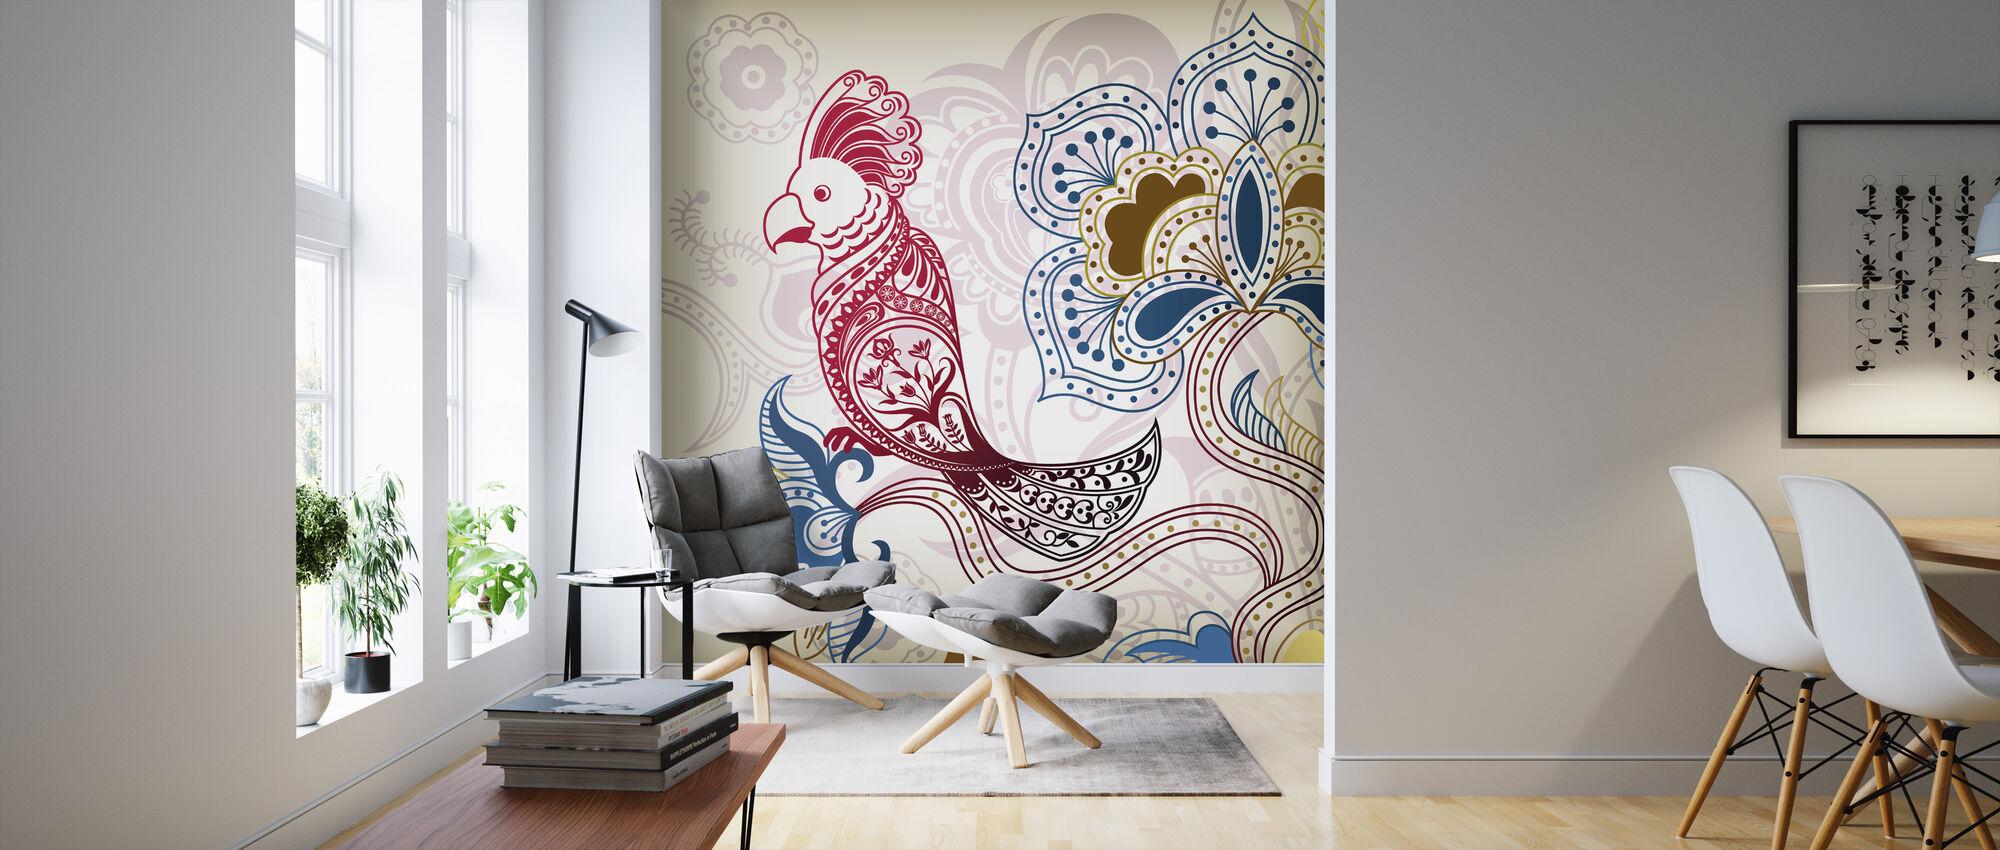 Floral Parrot - Wallpaper - Living Room